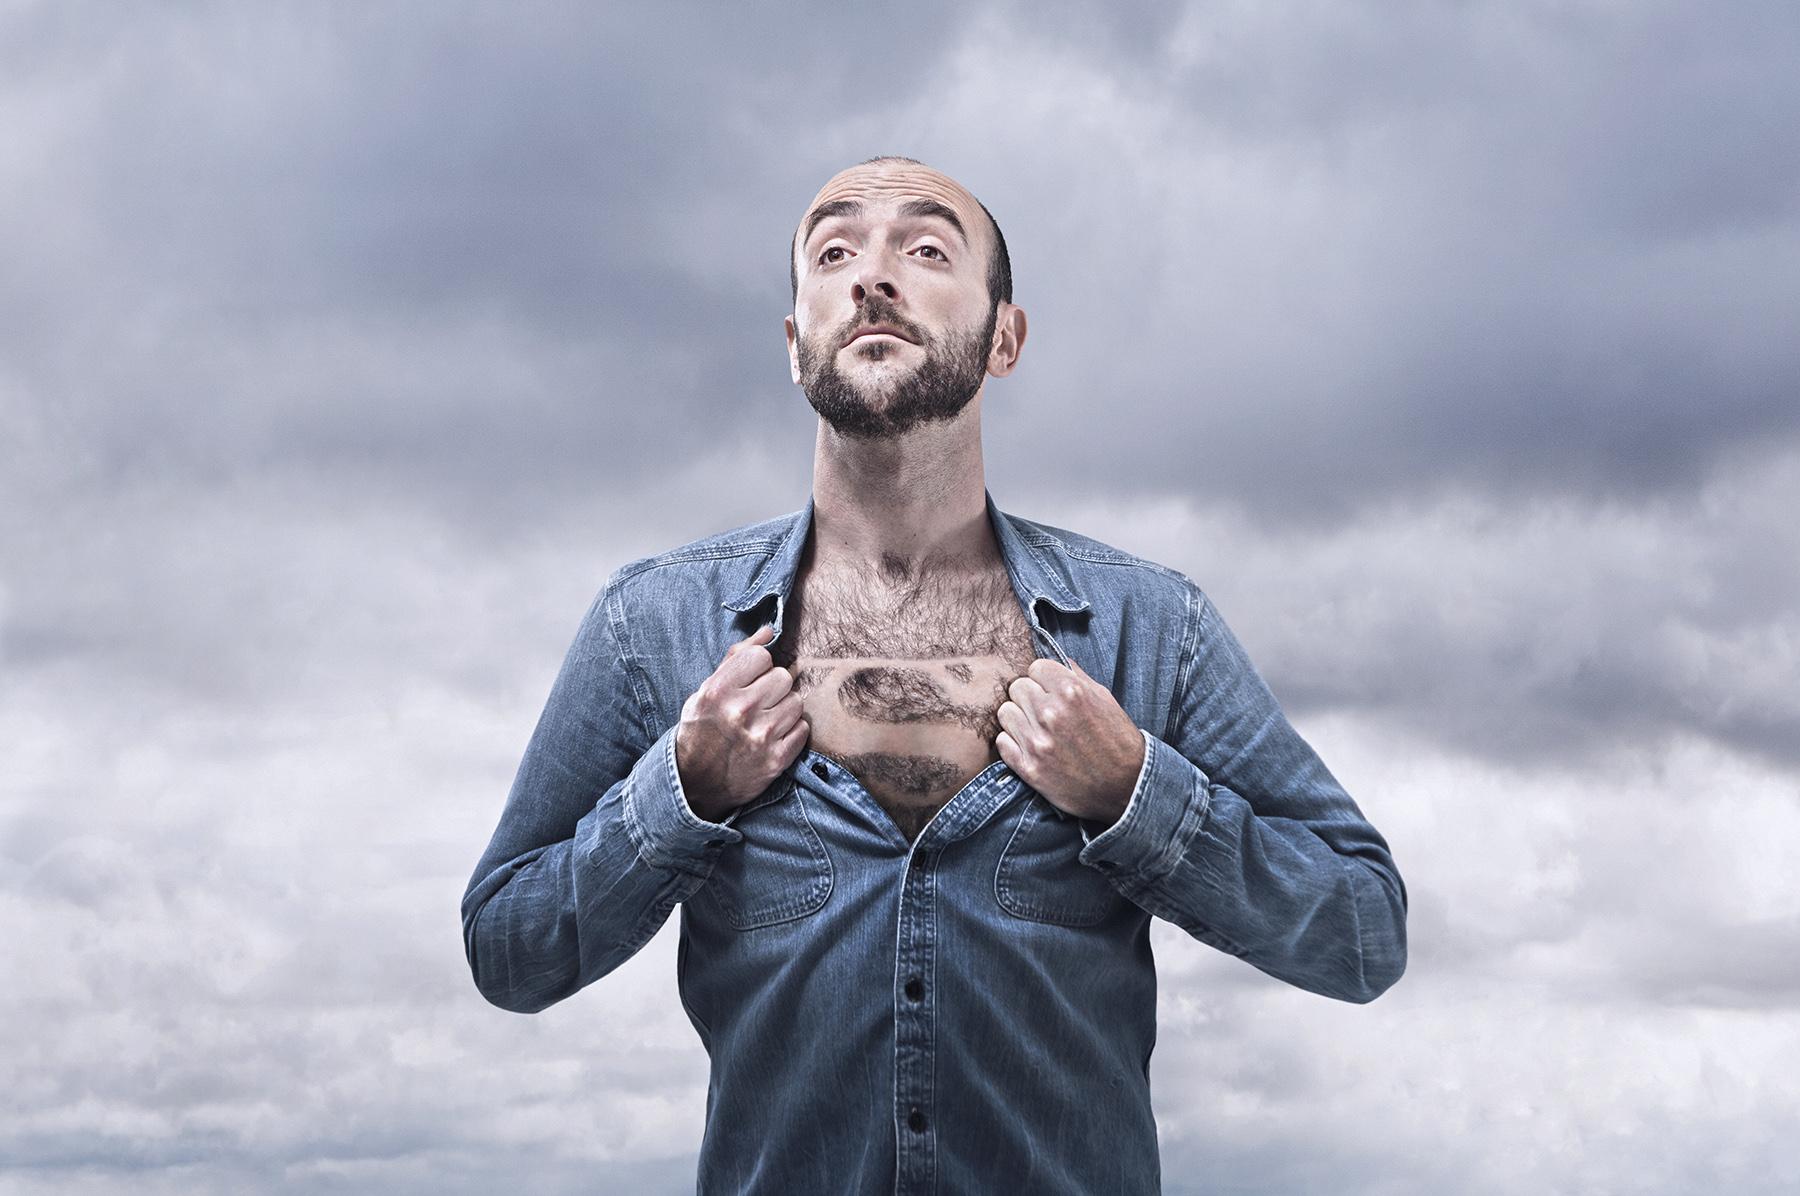 Dan Prince - Super me! Man with beard